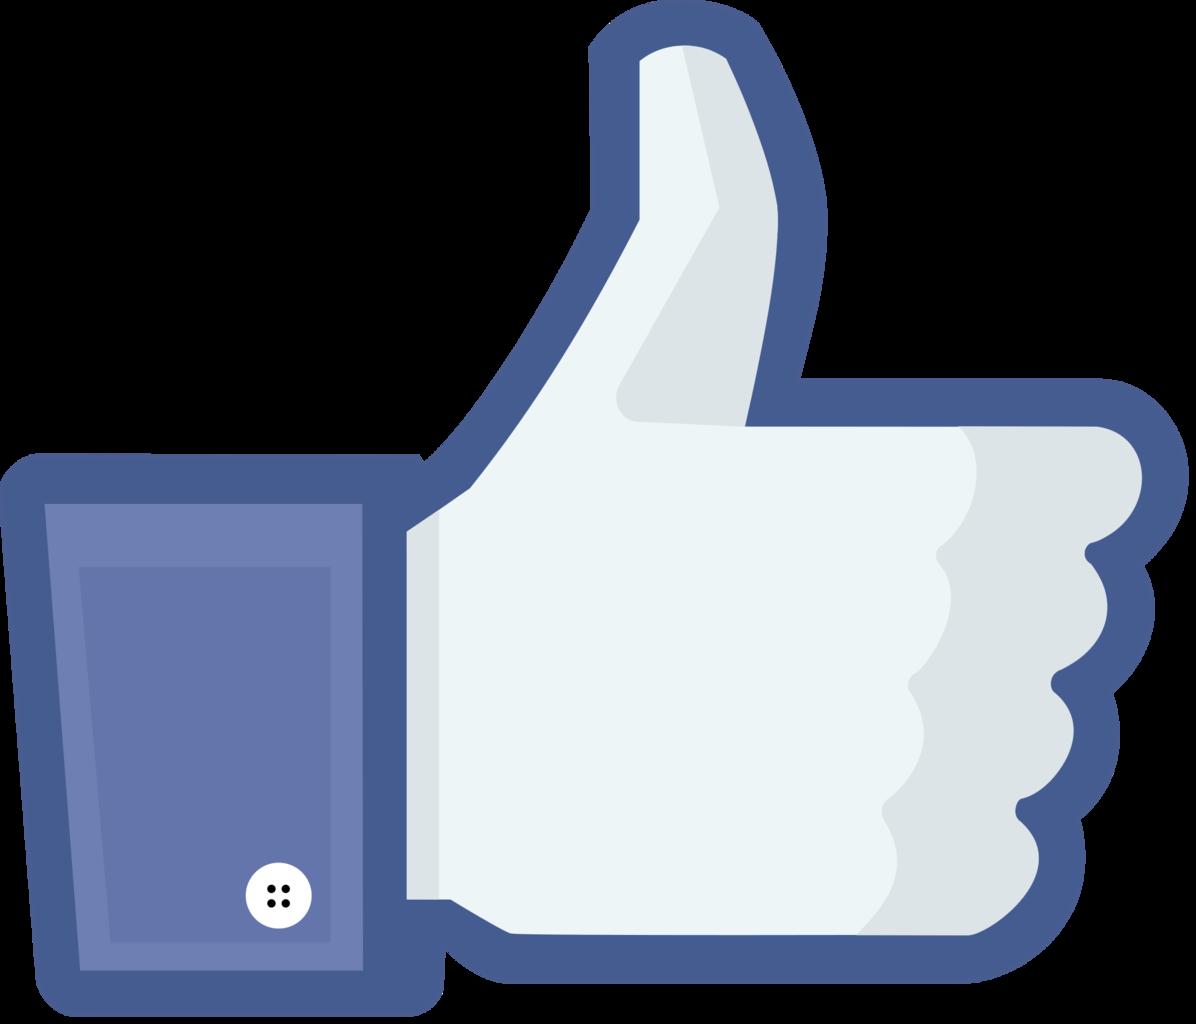 Icono me gusta facebook vector